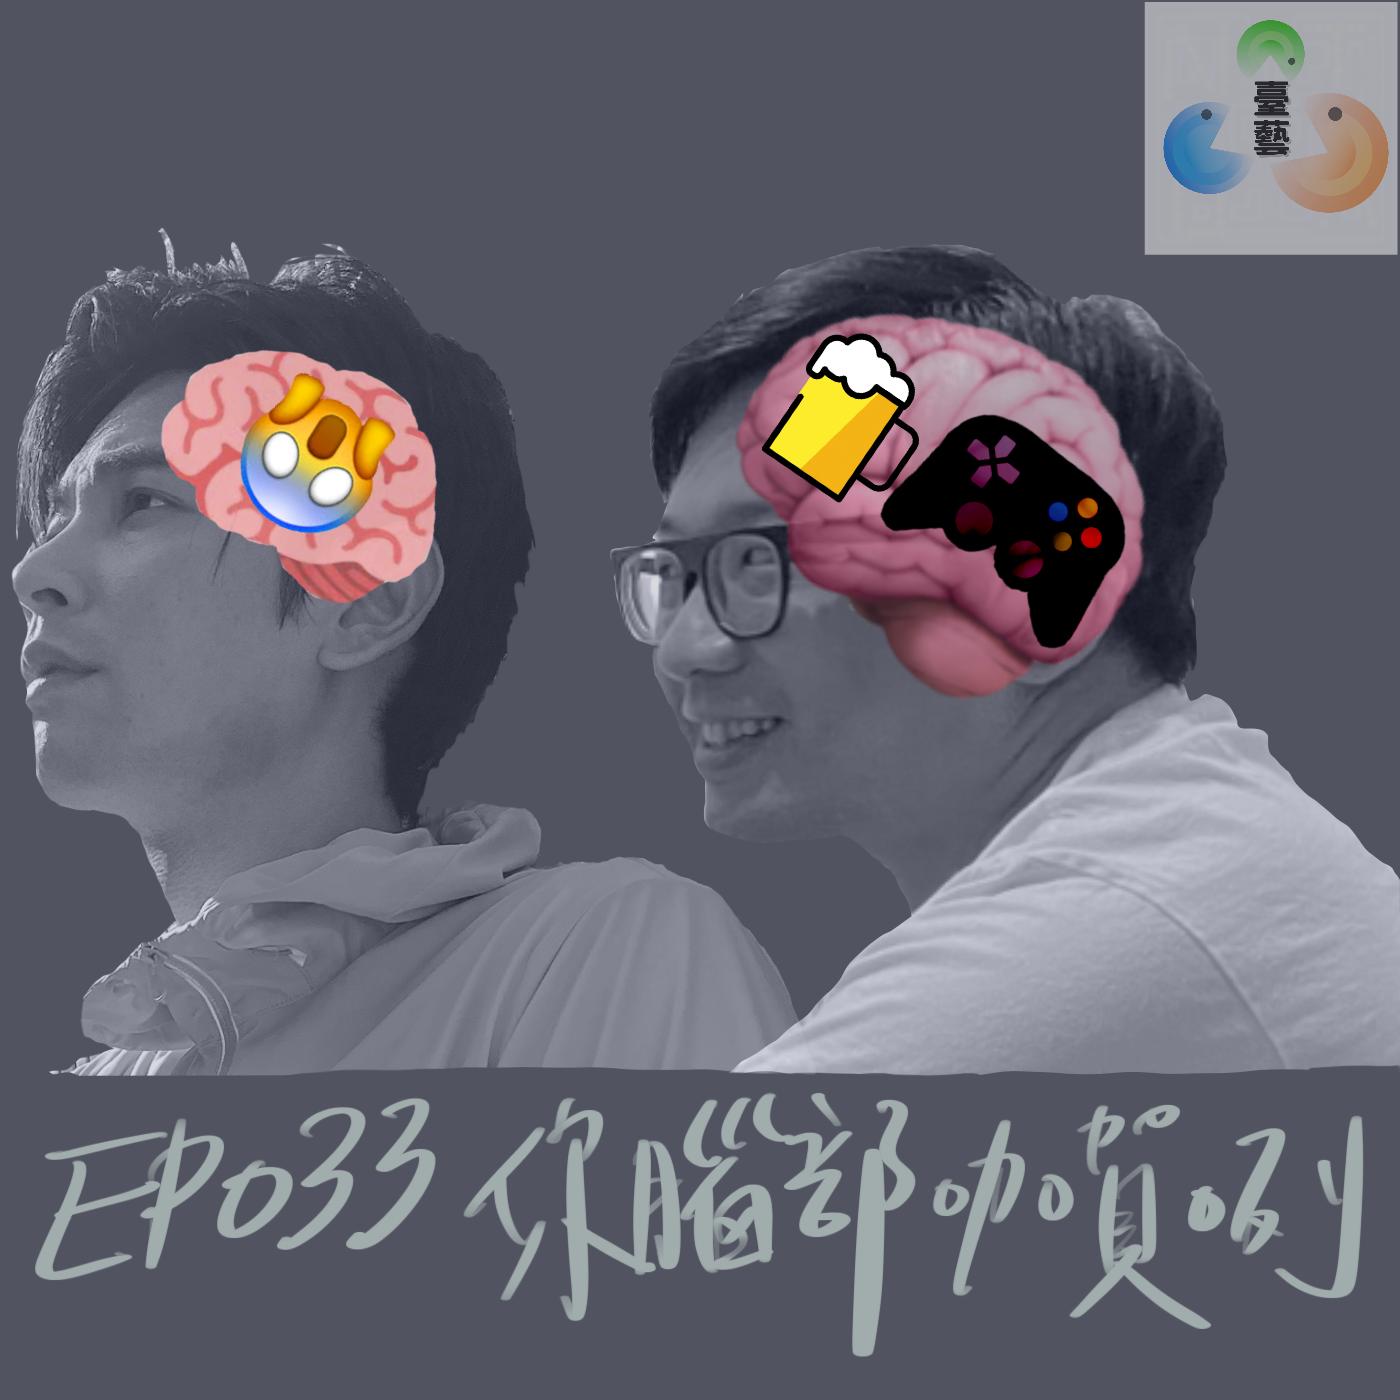 EP033你腦部咖賀咧